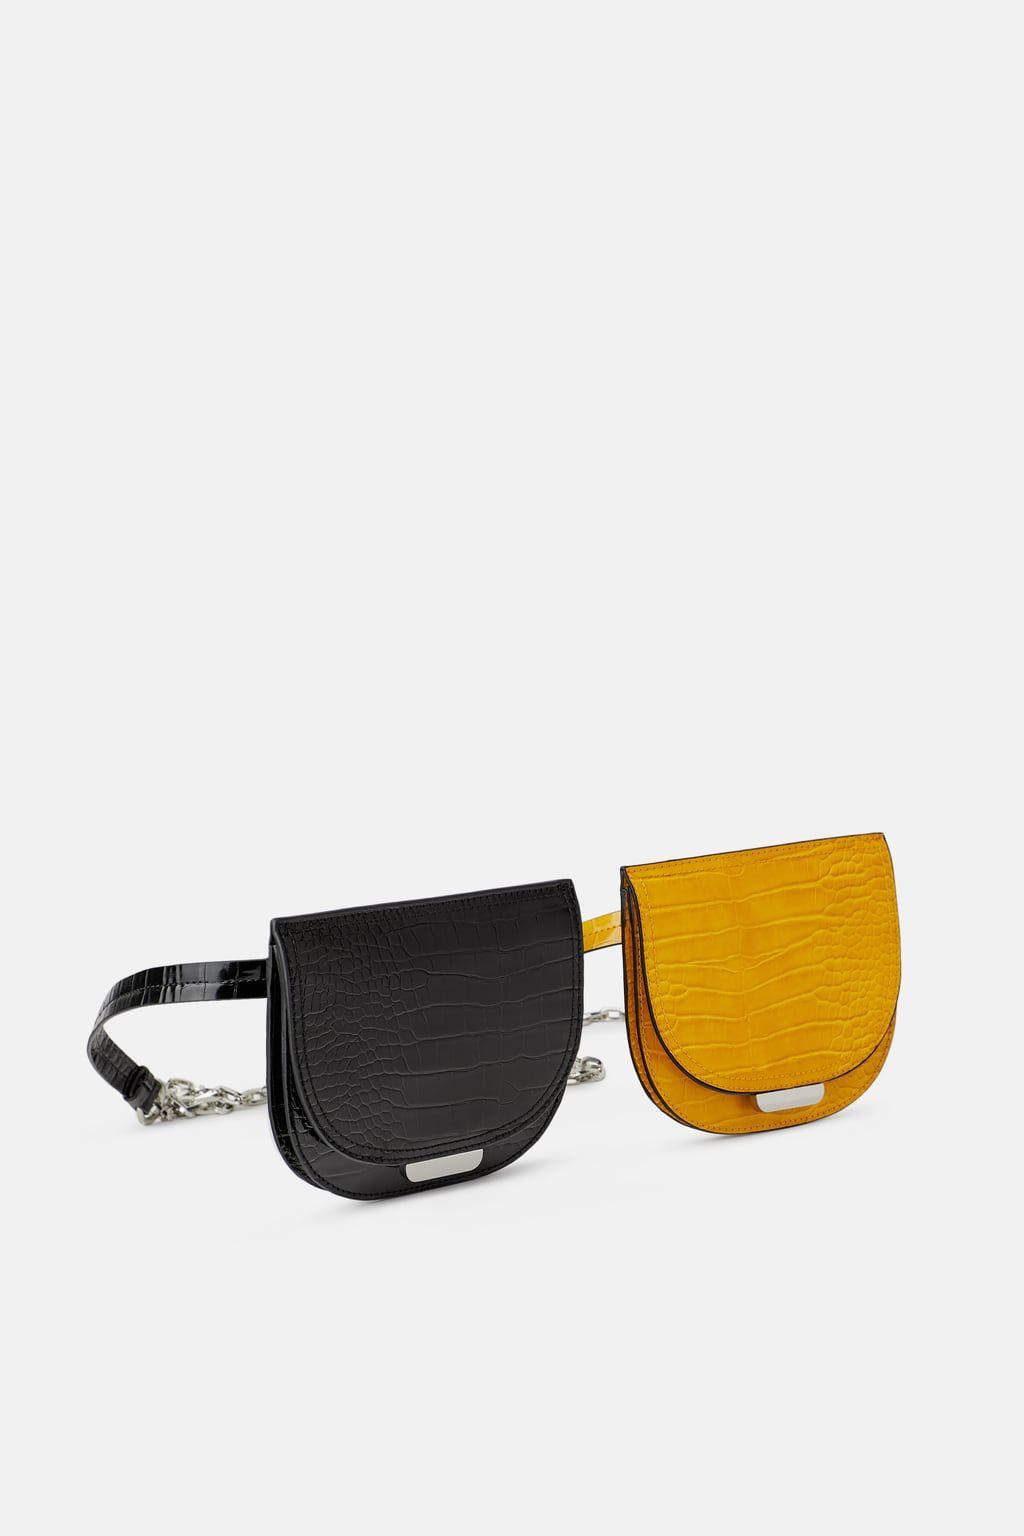 Elegant Belt Small Women Waist Bag Belt Bag 3D Floral PU Leather Fanny Pack Removable Belt with Waist Pouch Mini Purse Wallet Travel Cell Phone Bag Simple Ladies Belt